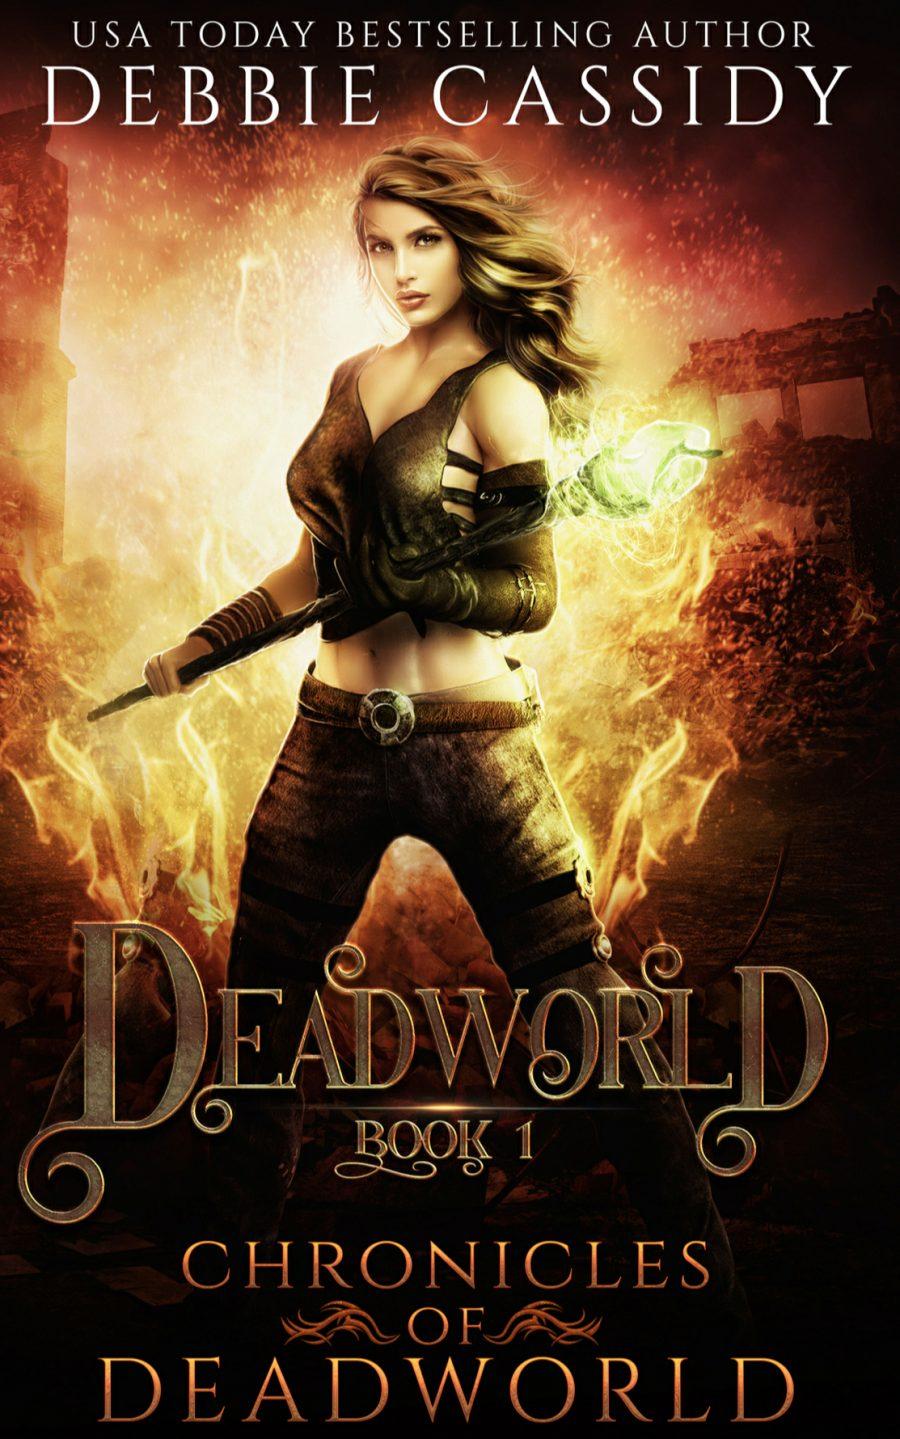 Deadworld: Chronicles of Deadworld - Book 1 by Debbie Cassidy - A Book Review #BookReview #PNR #Slowburn #RH #Dystopian #SeriesComplete #KindleUnlimited #KU #MustRead